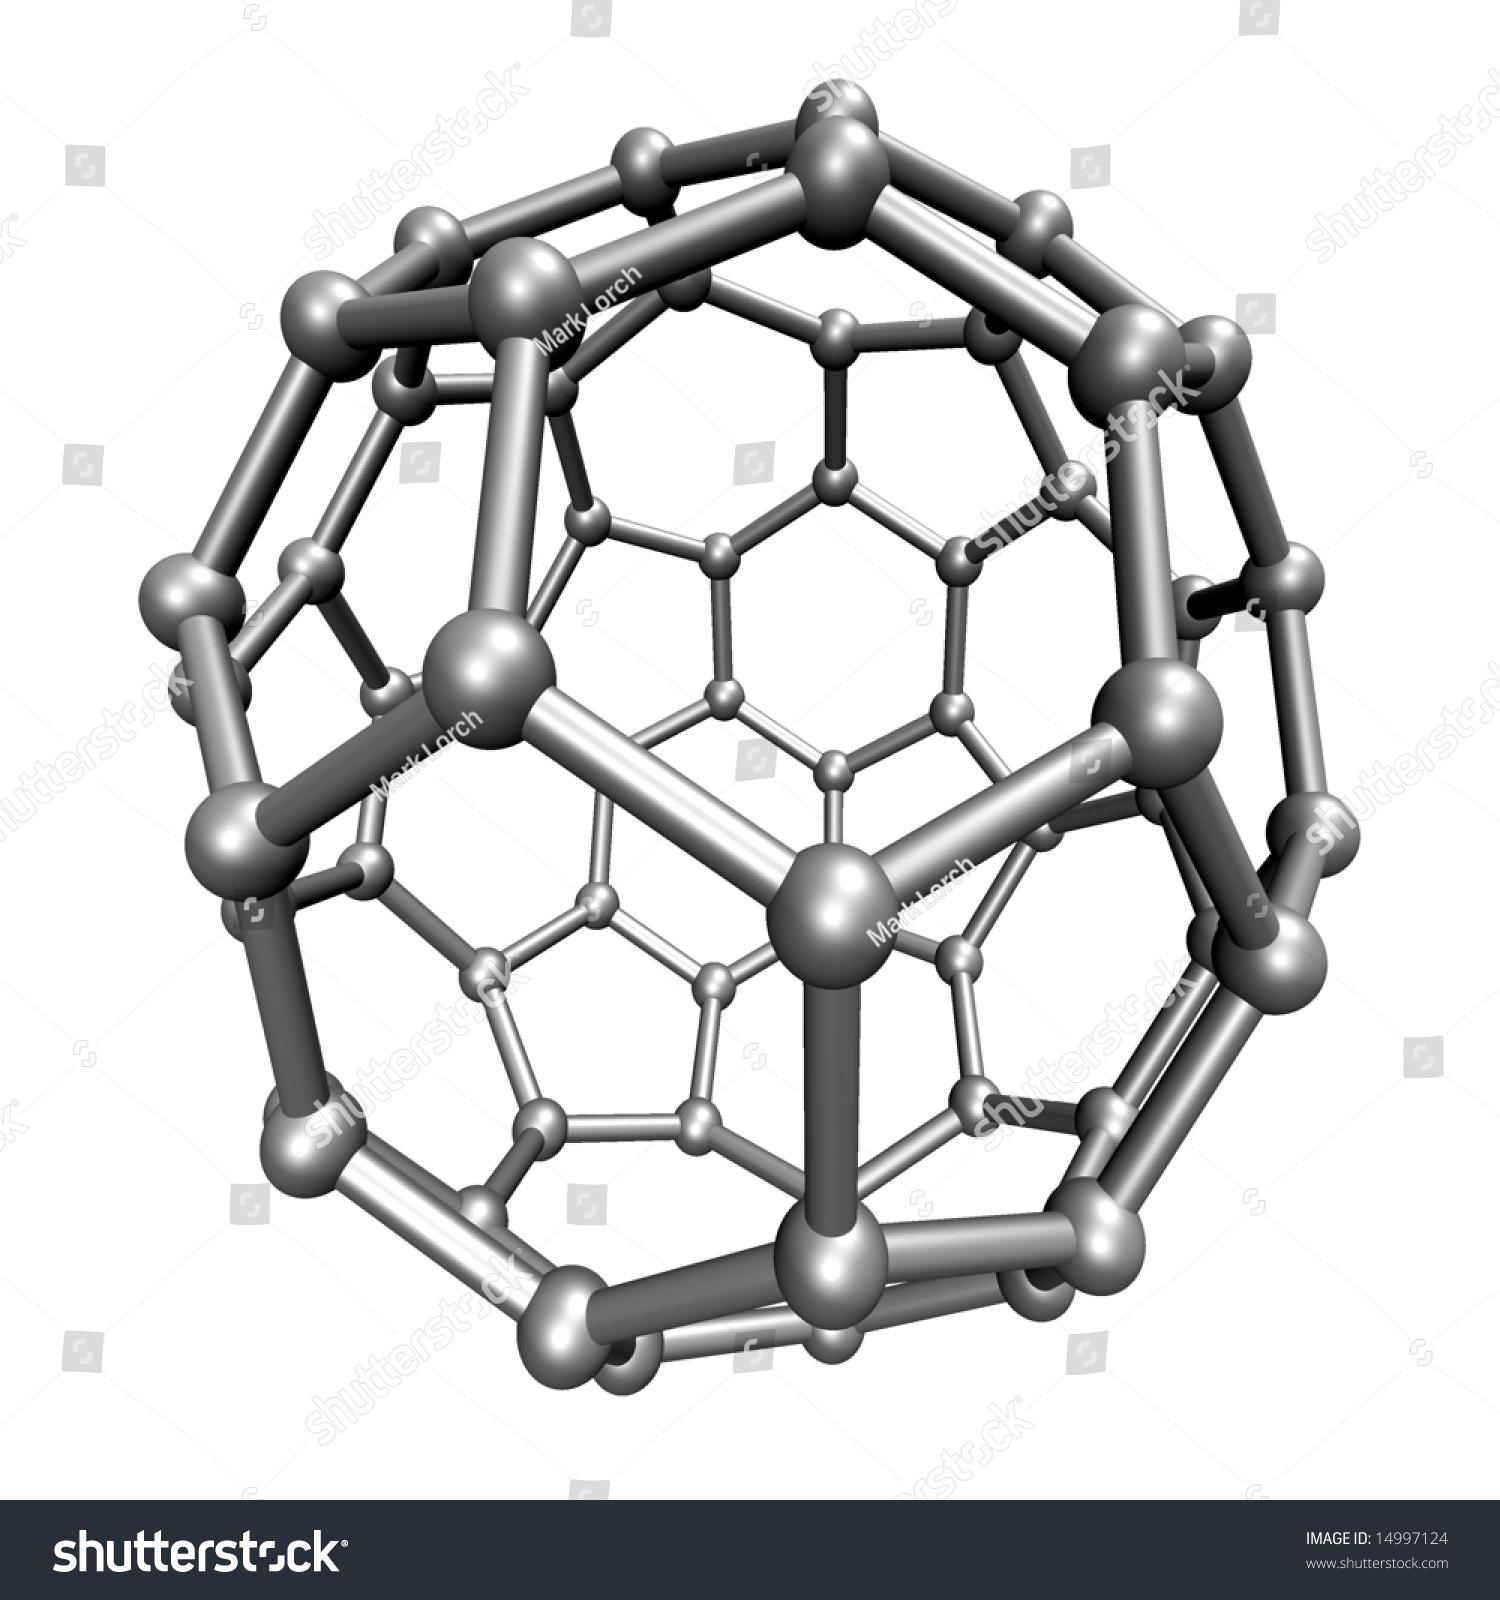 Buckminsterfullerene Flat